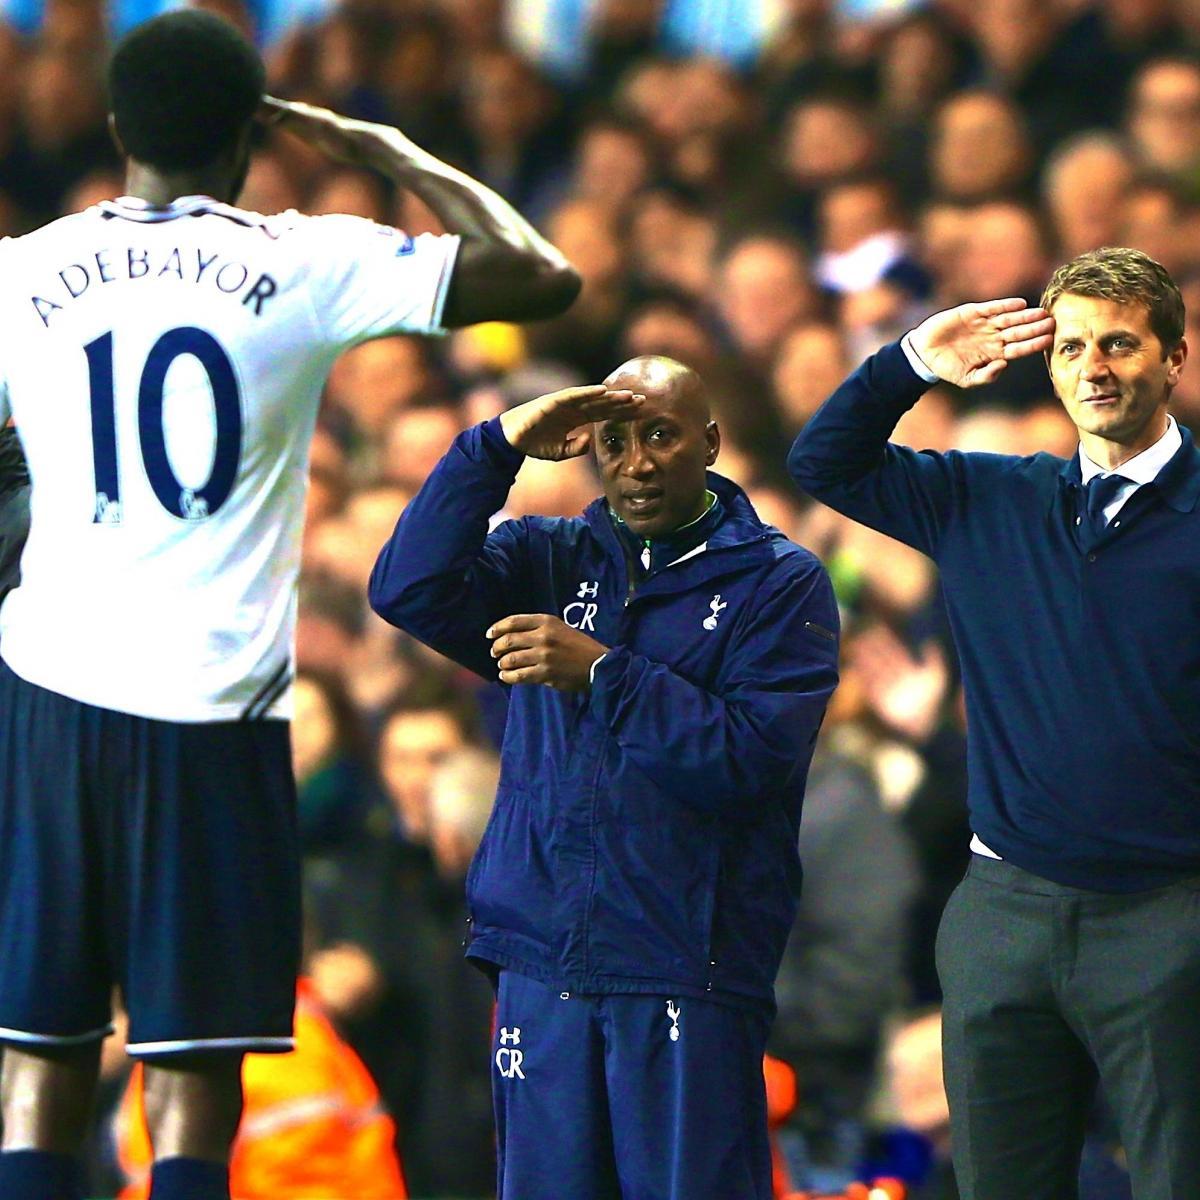 Tottenham 3 Fulham 1 Match Highlights Harry Kane Scores: Tottenham Hotspur Vs. Sunderland: Score, Grades And Post